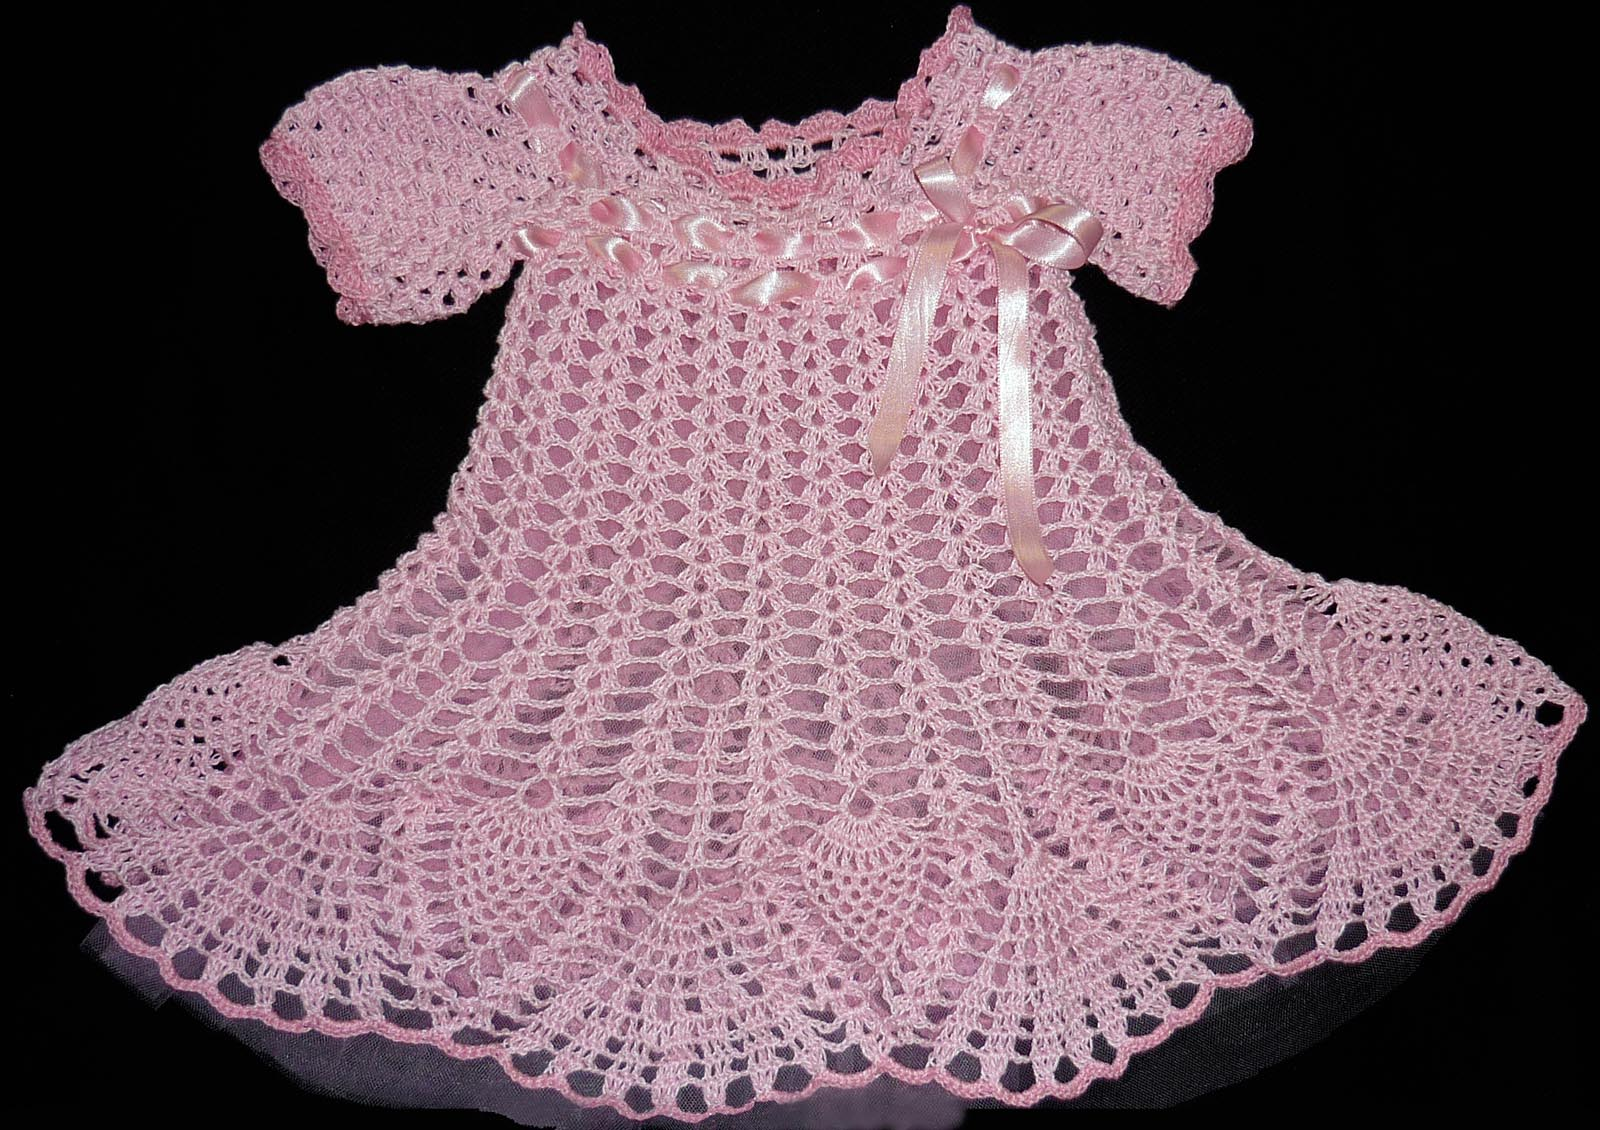 Vestidos de bebés tejido a crochet - Imagui